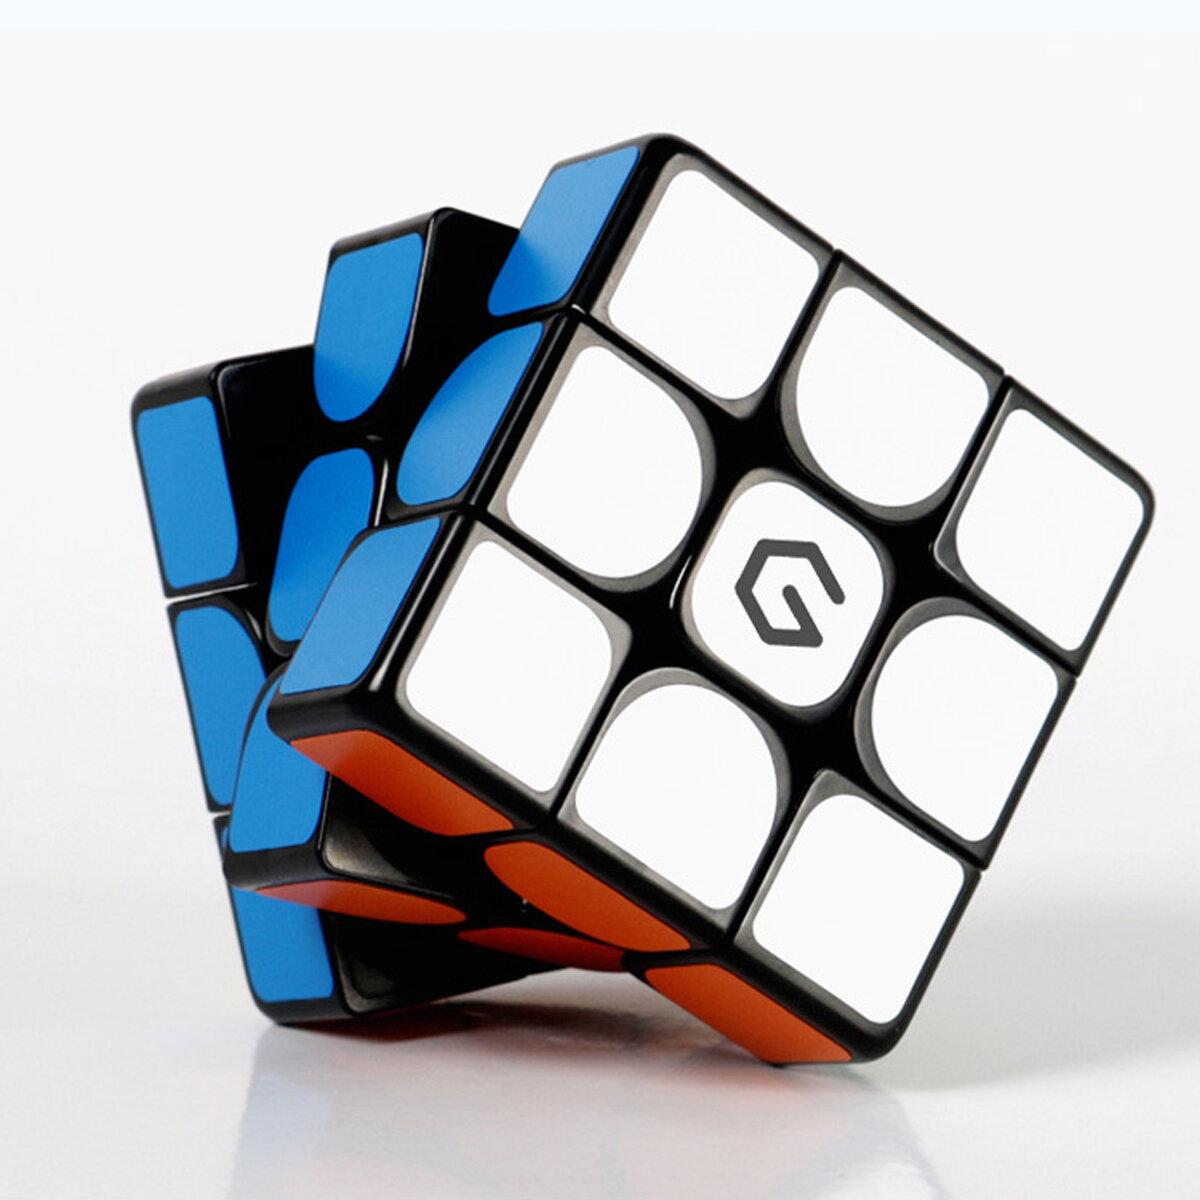 Giiker M3 चुंबकीय Cube 3x3x3 ज्वलंत रंग वर्ग जादू Cube पहेली विज्ञान शिक्षा खिलौना उपहार xiaomi youpin से